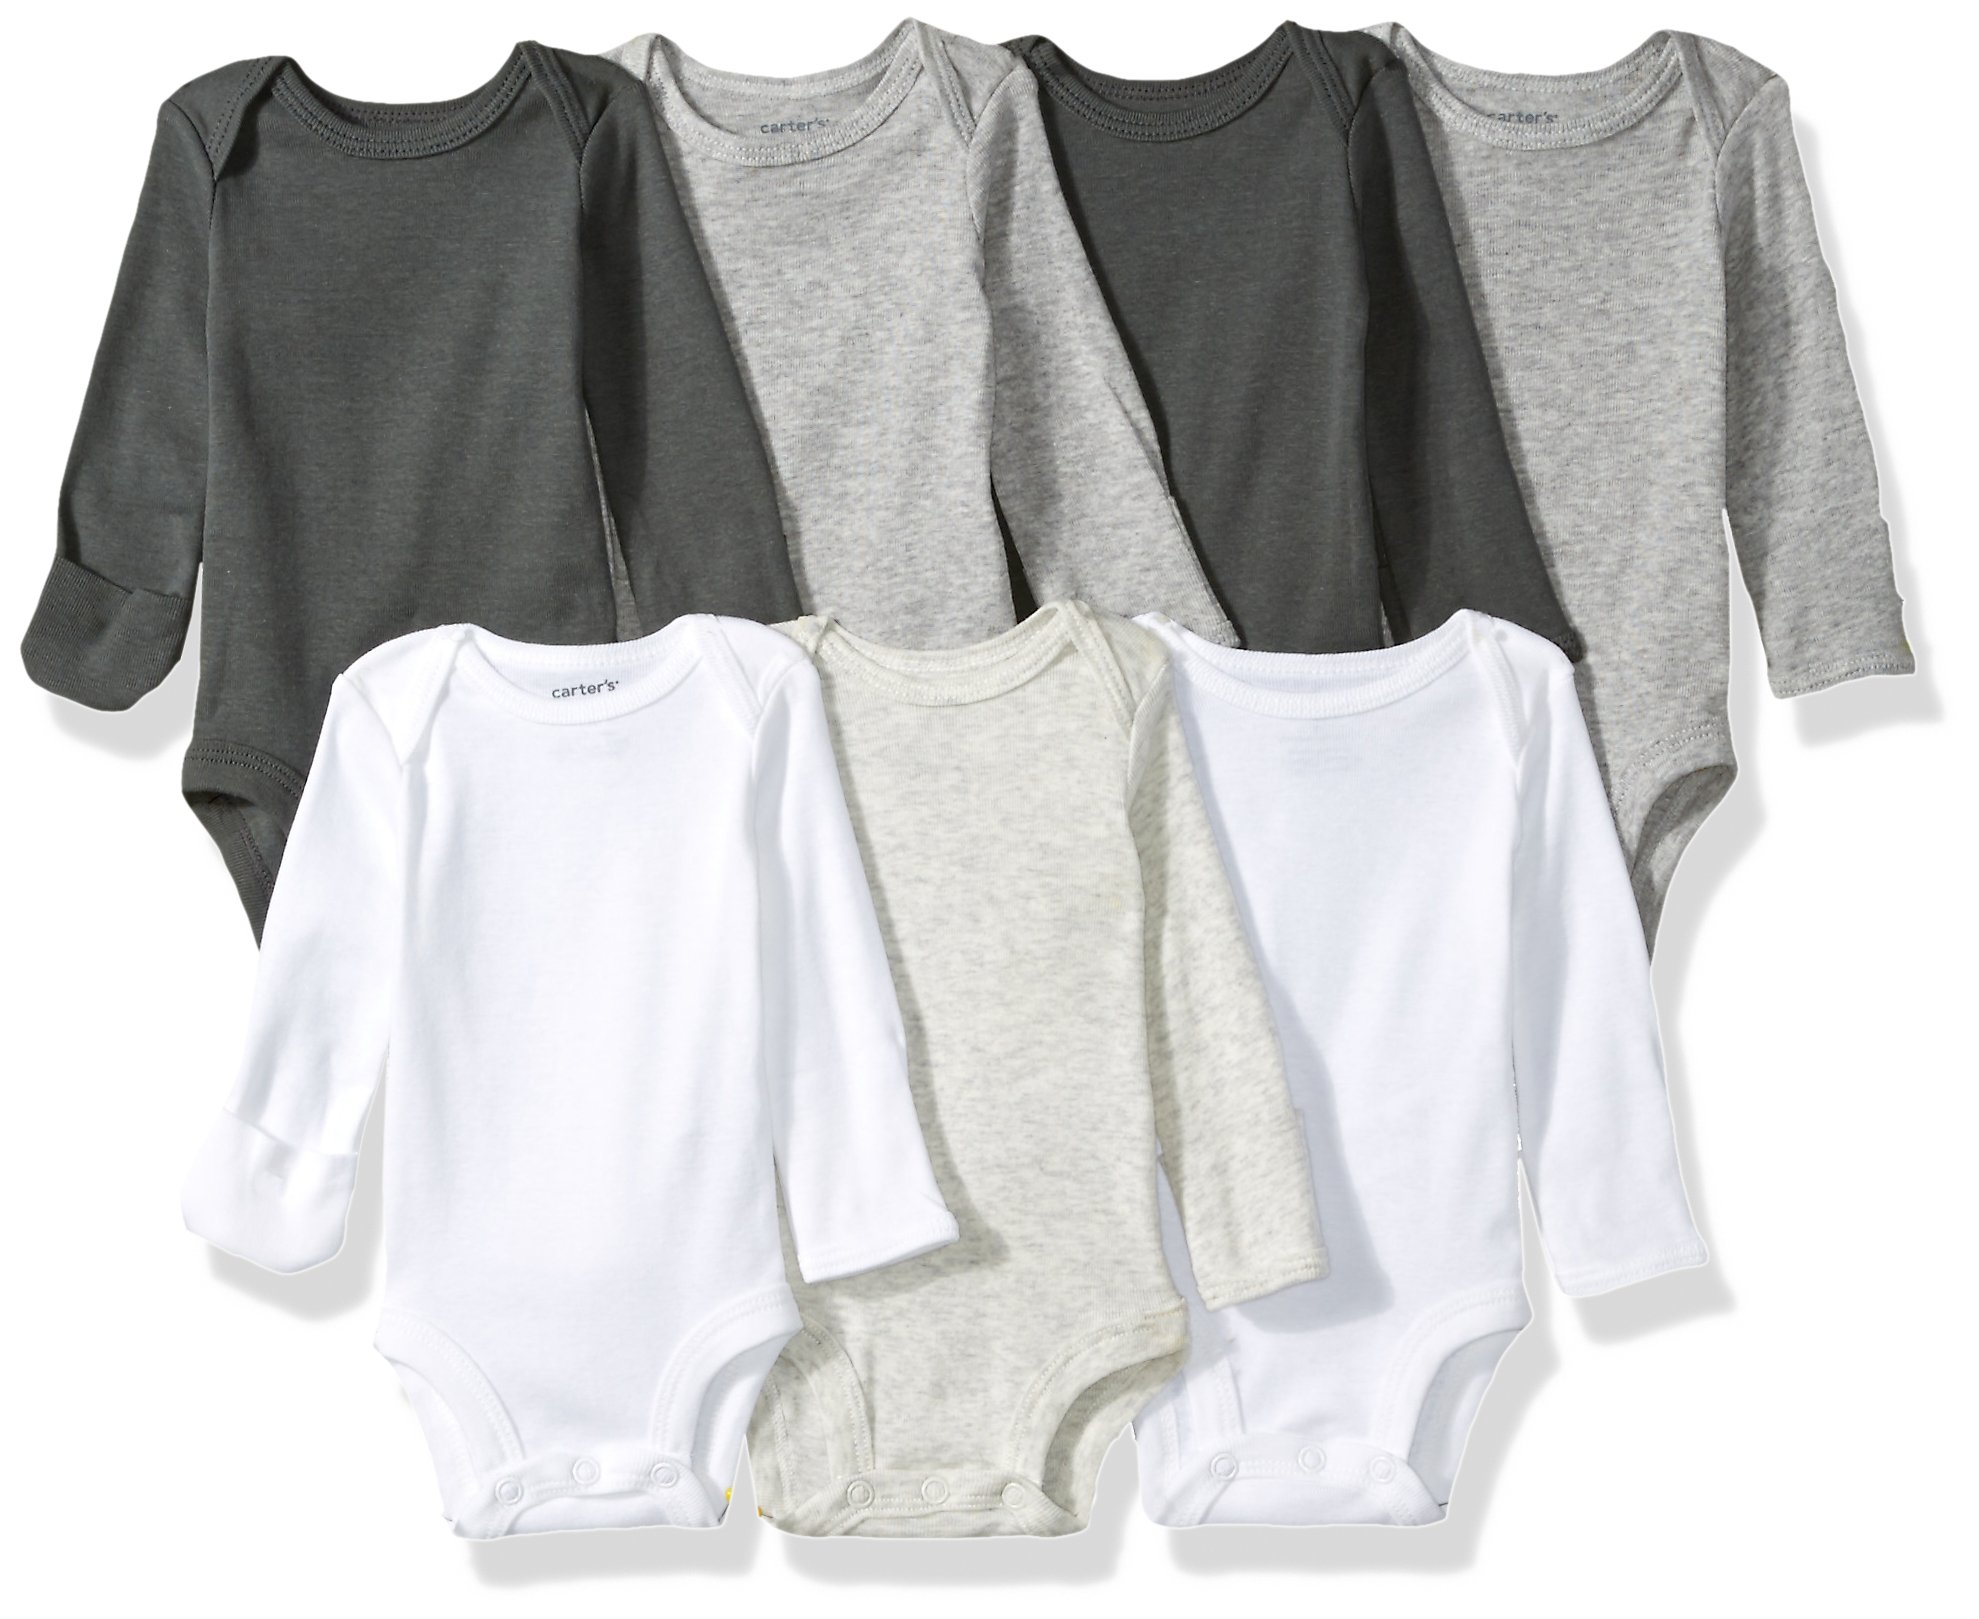 Carter's Baby Girls' 7-Pack Long-Sleeve Bodysuits 1